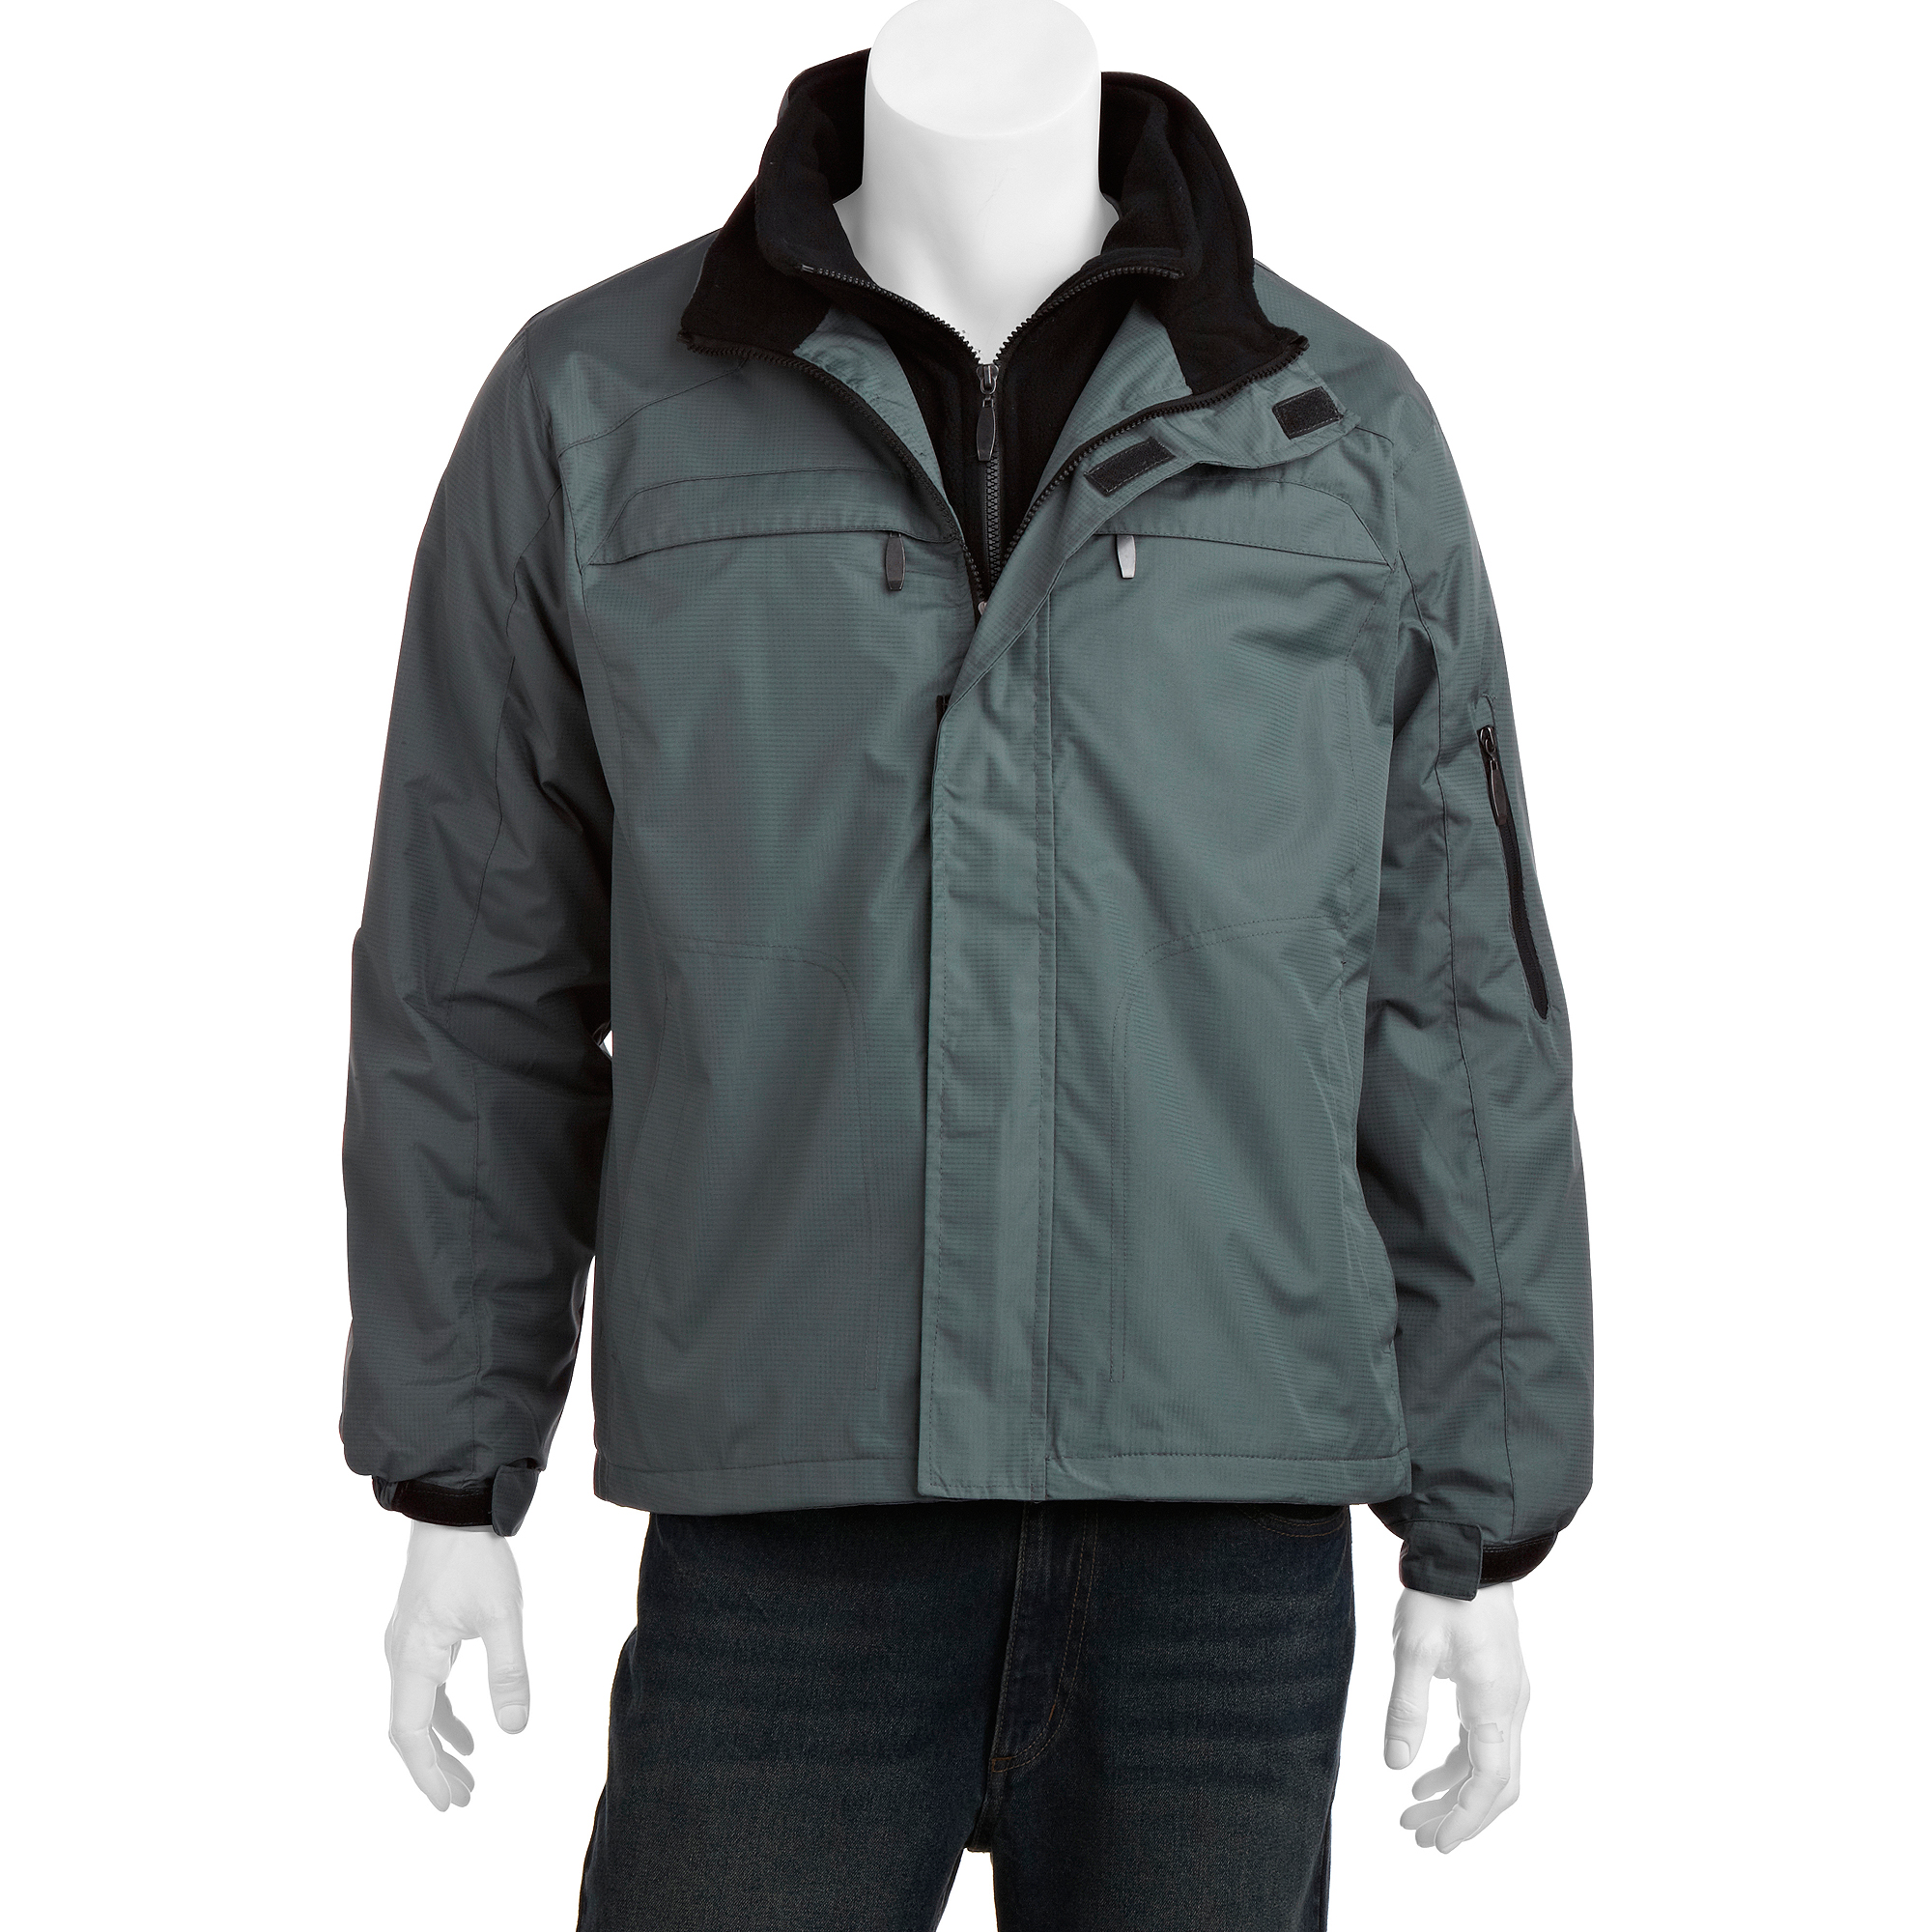 Big Men's Ripstop jacket with Polar Fleece Lining